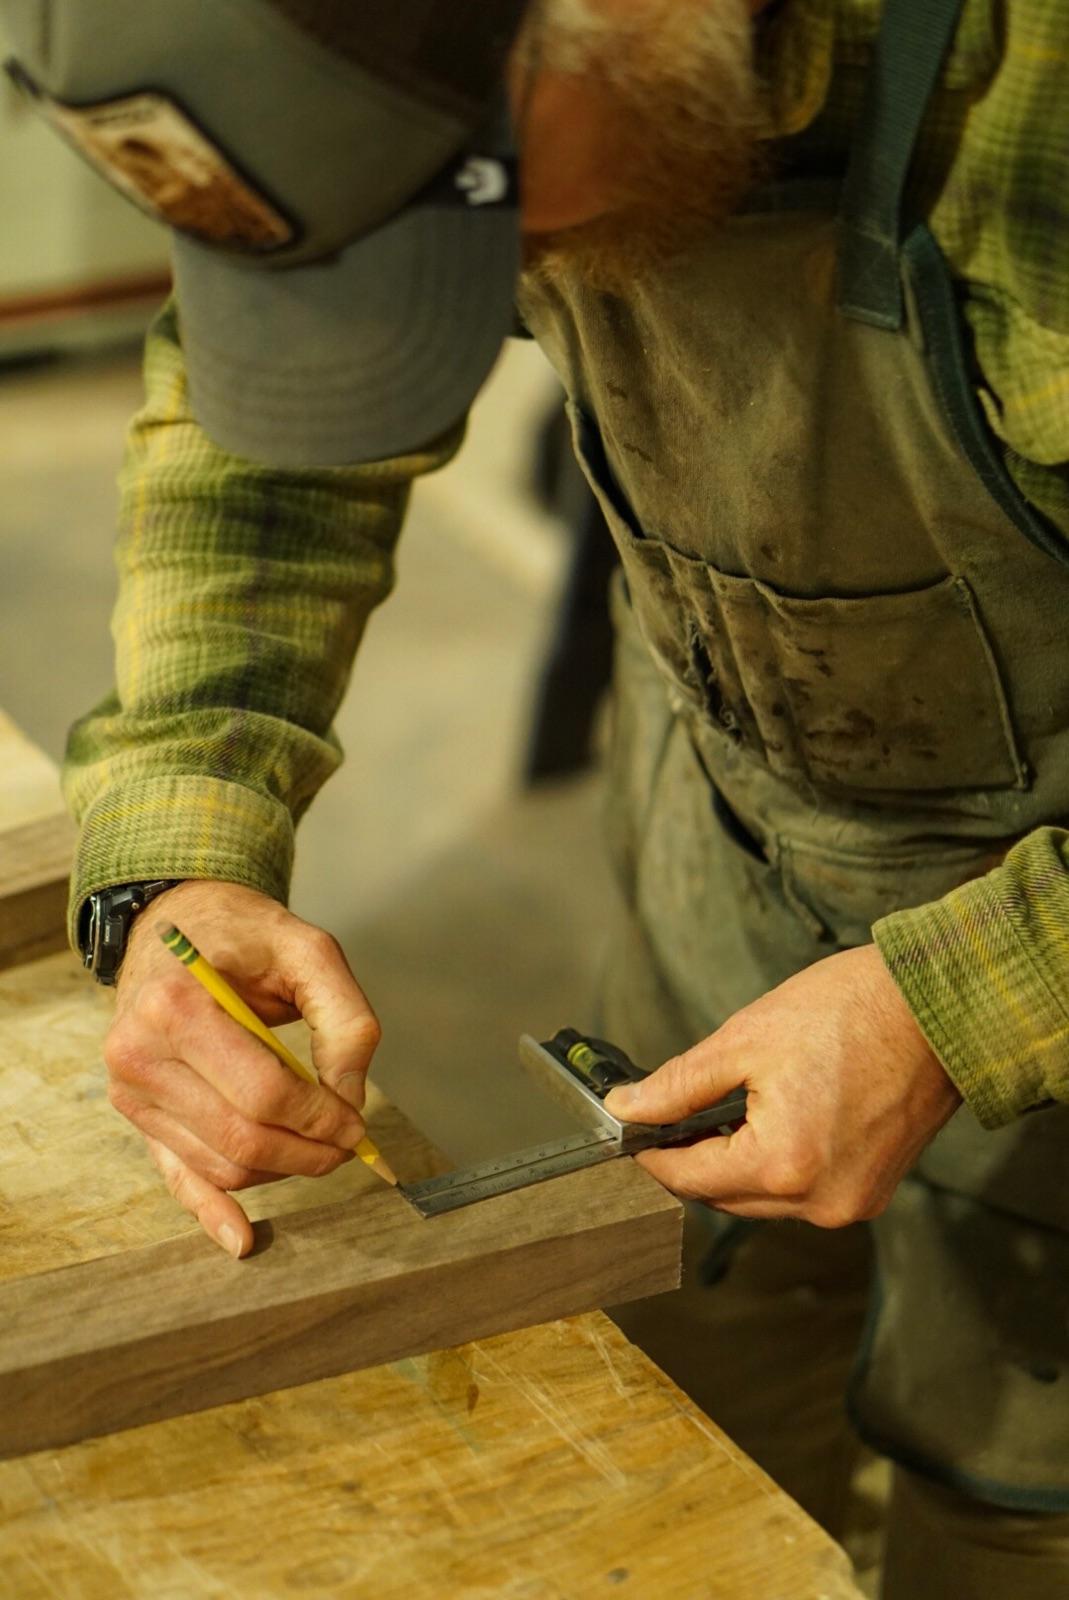 Jason demonstrating the precision involved